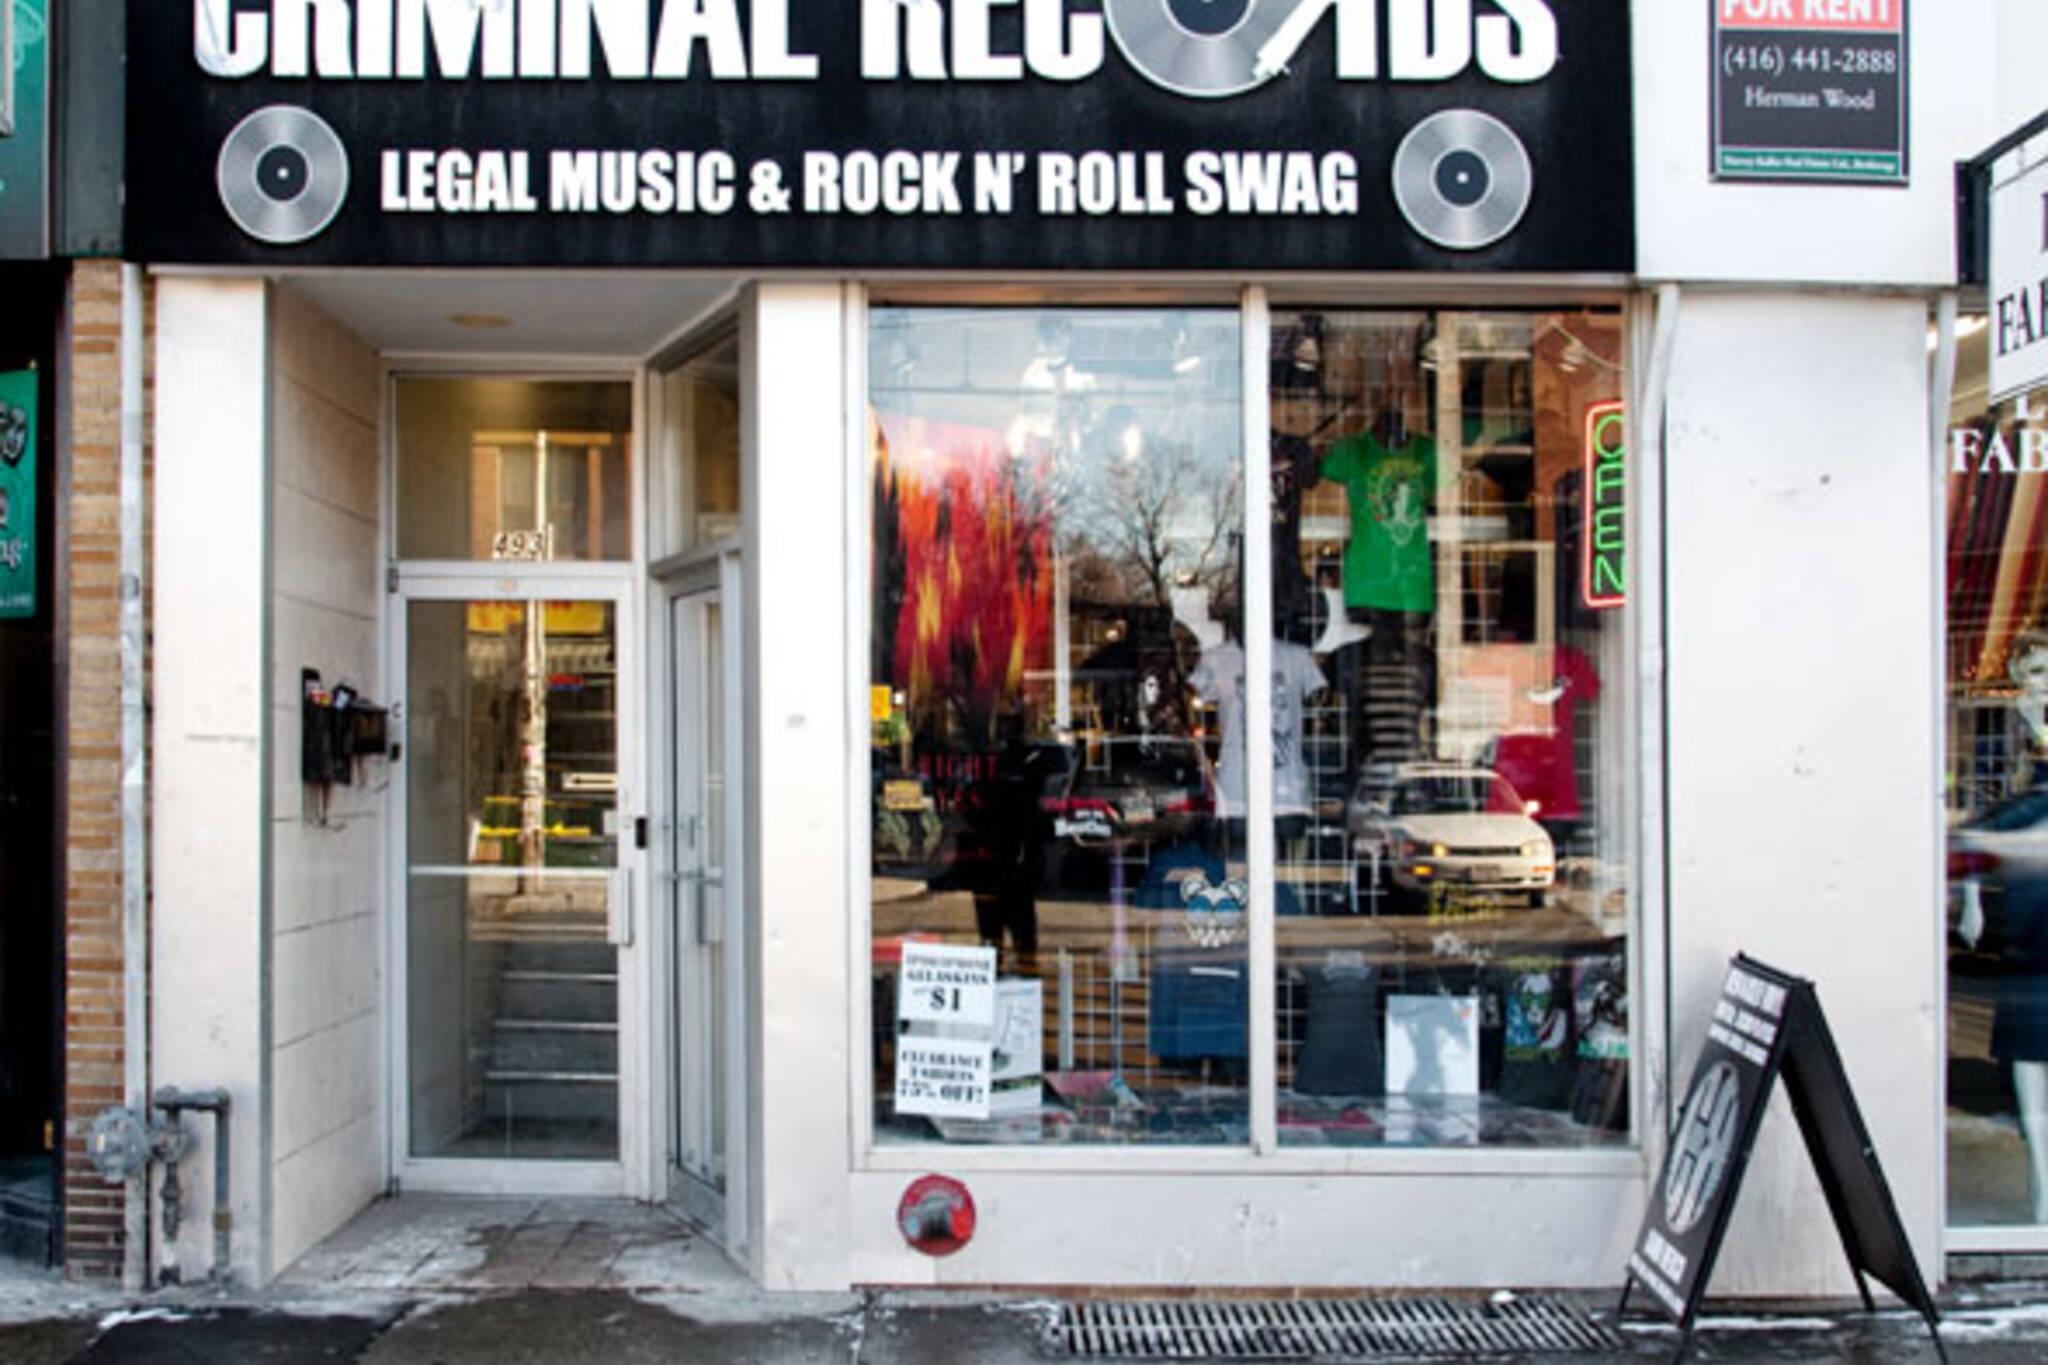 Criminal Records Window